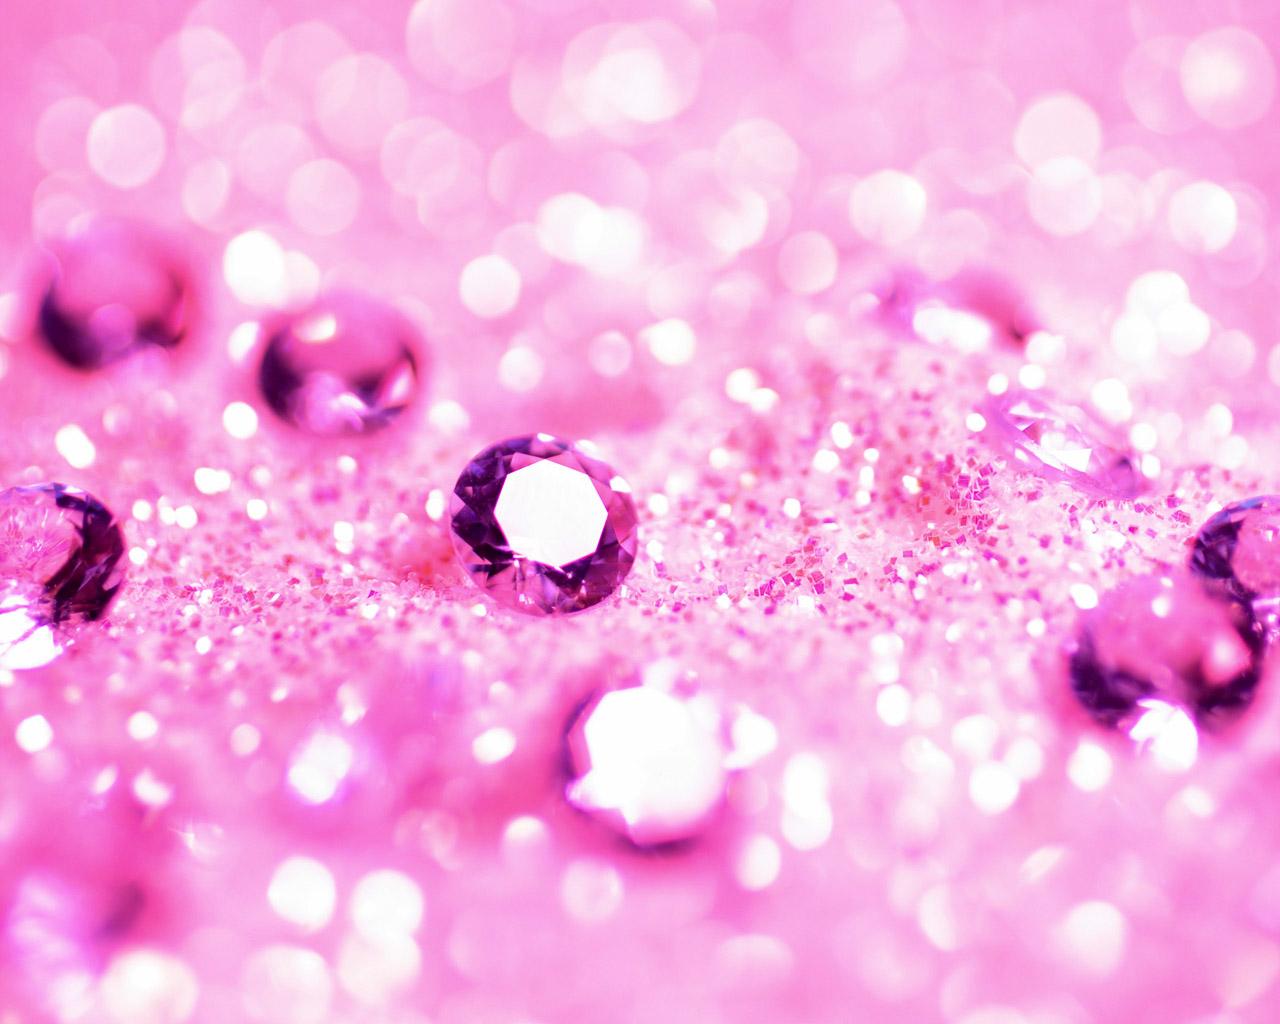 pink glitter wallpaper   Glitter Wall Coverings Glitter Bug Wallpaper 1280x1024